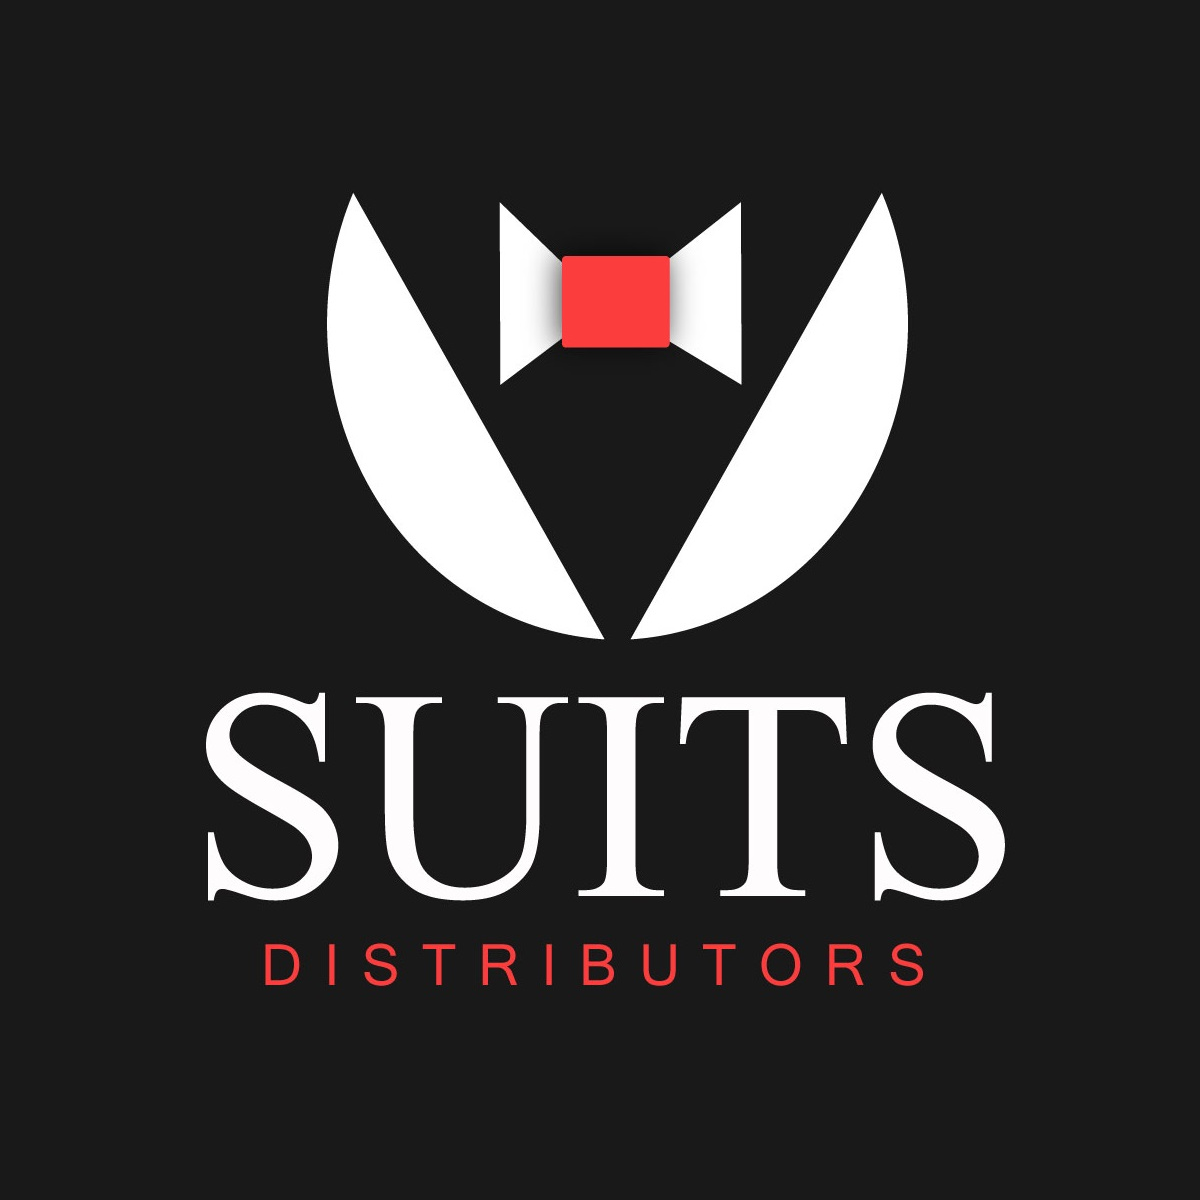 Suits Distributors Logo